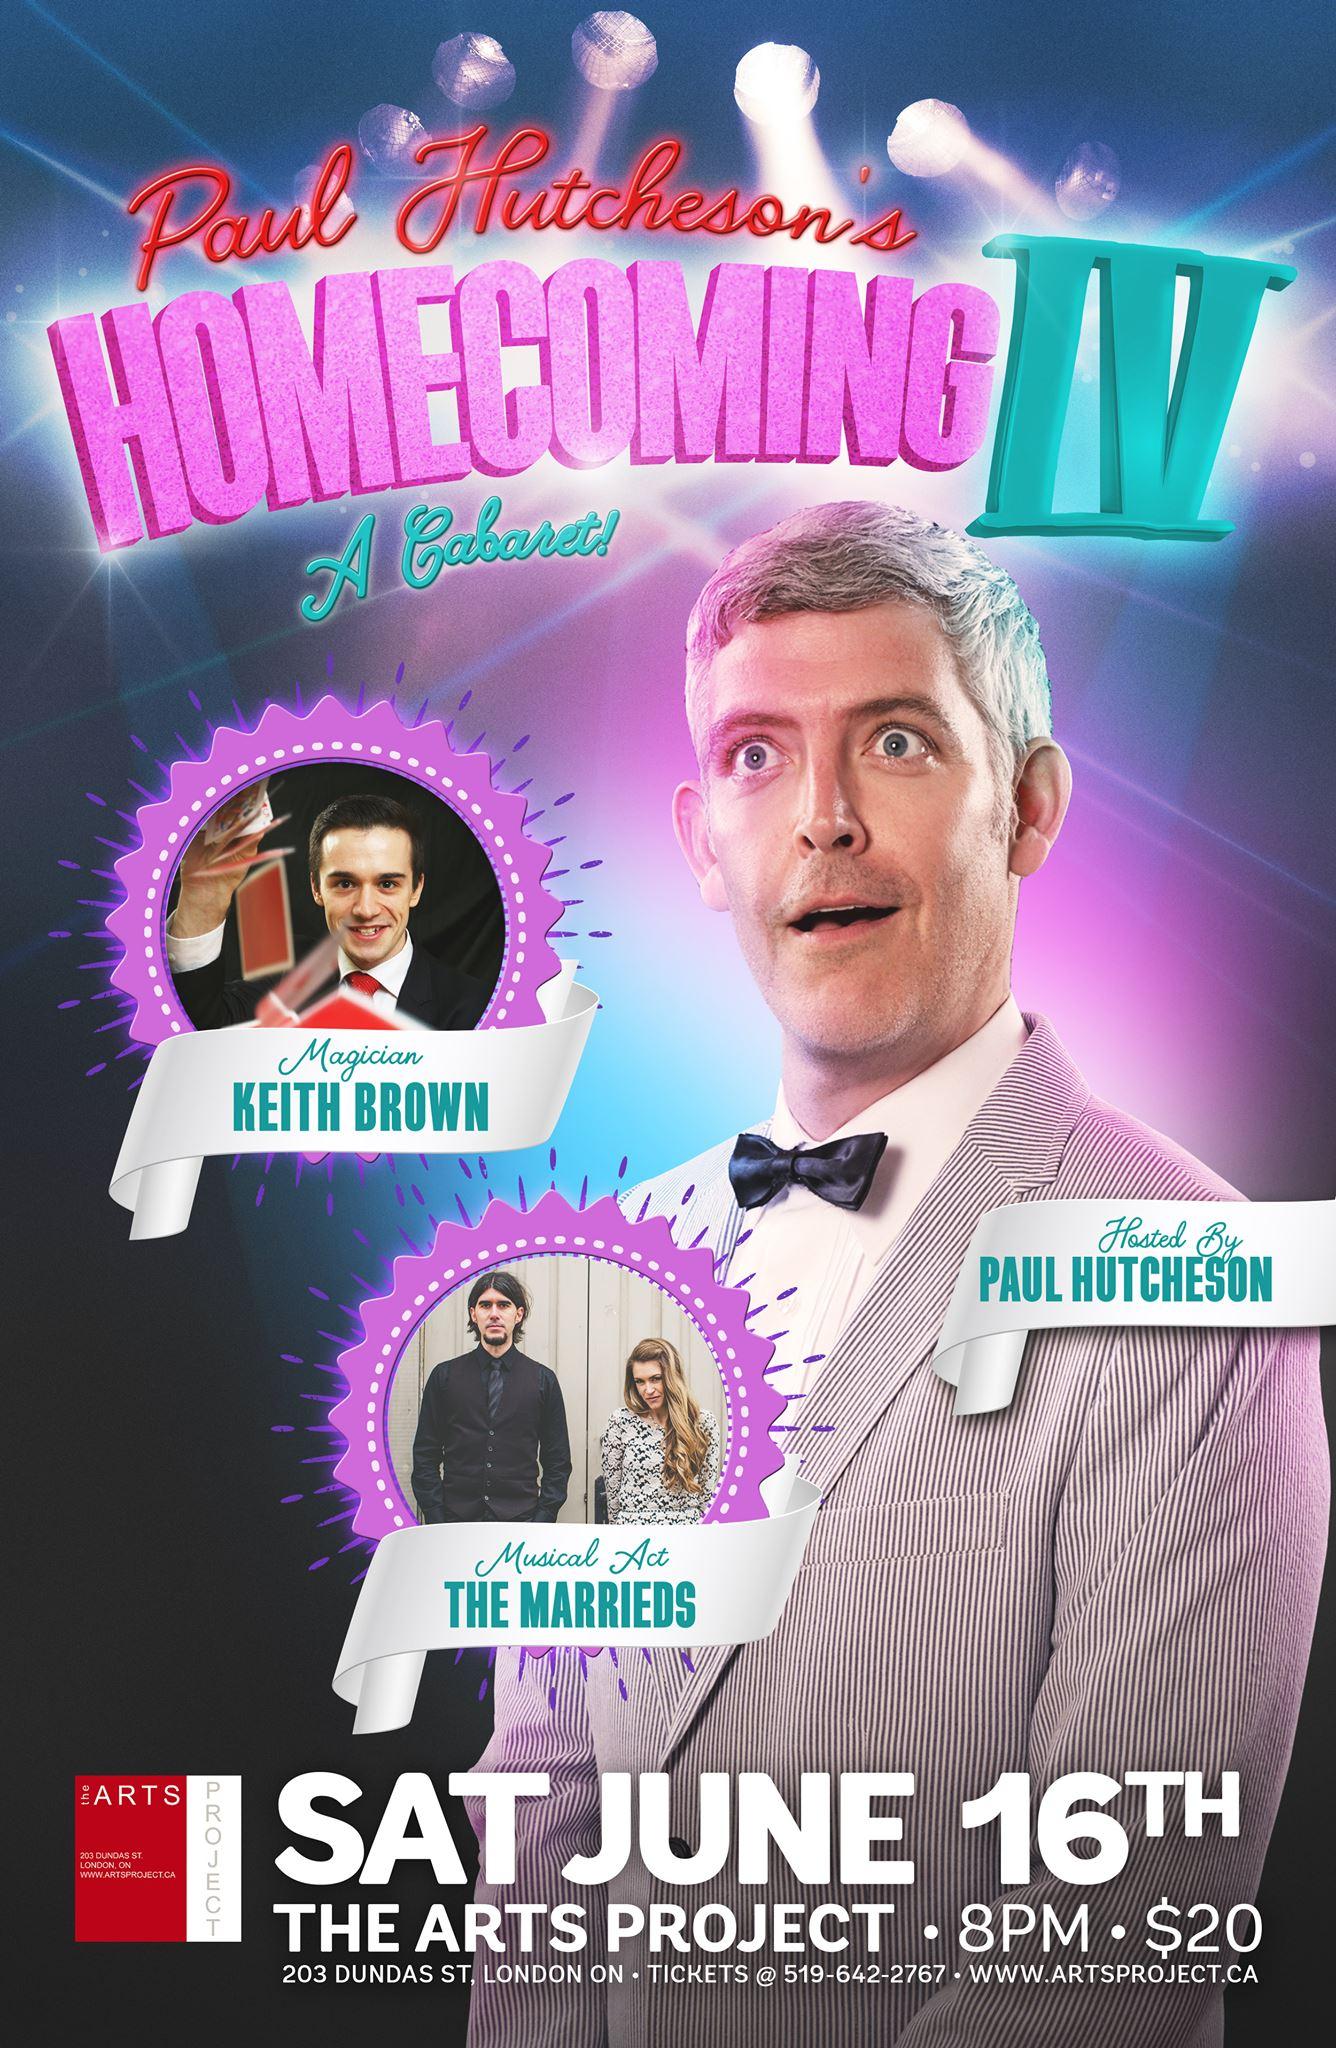 paul_hutcheson_homecoming_IV